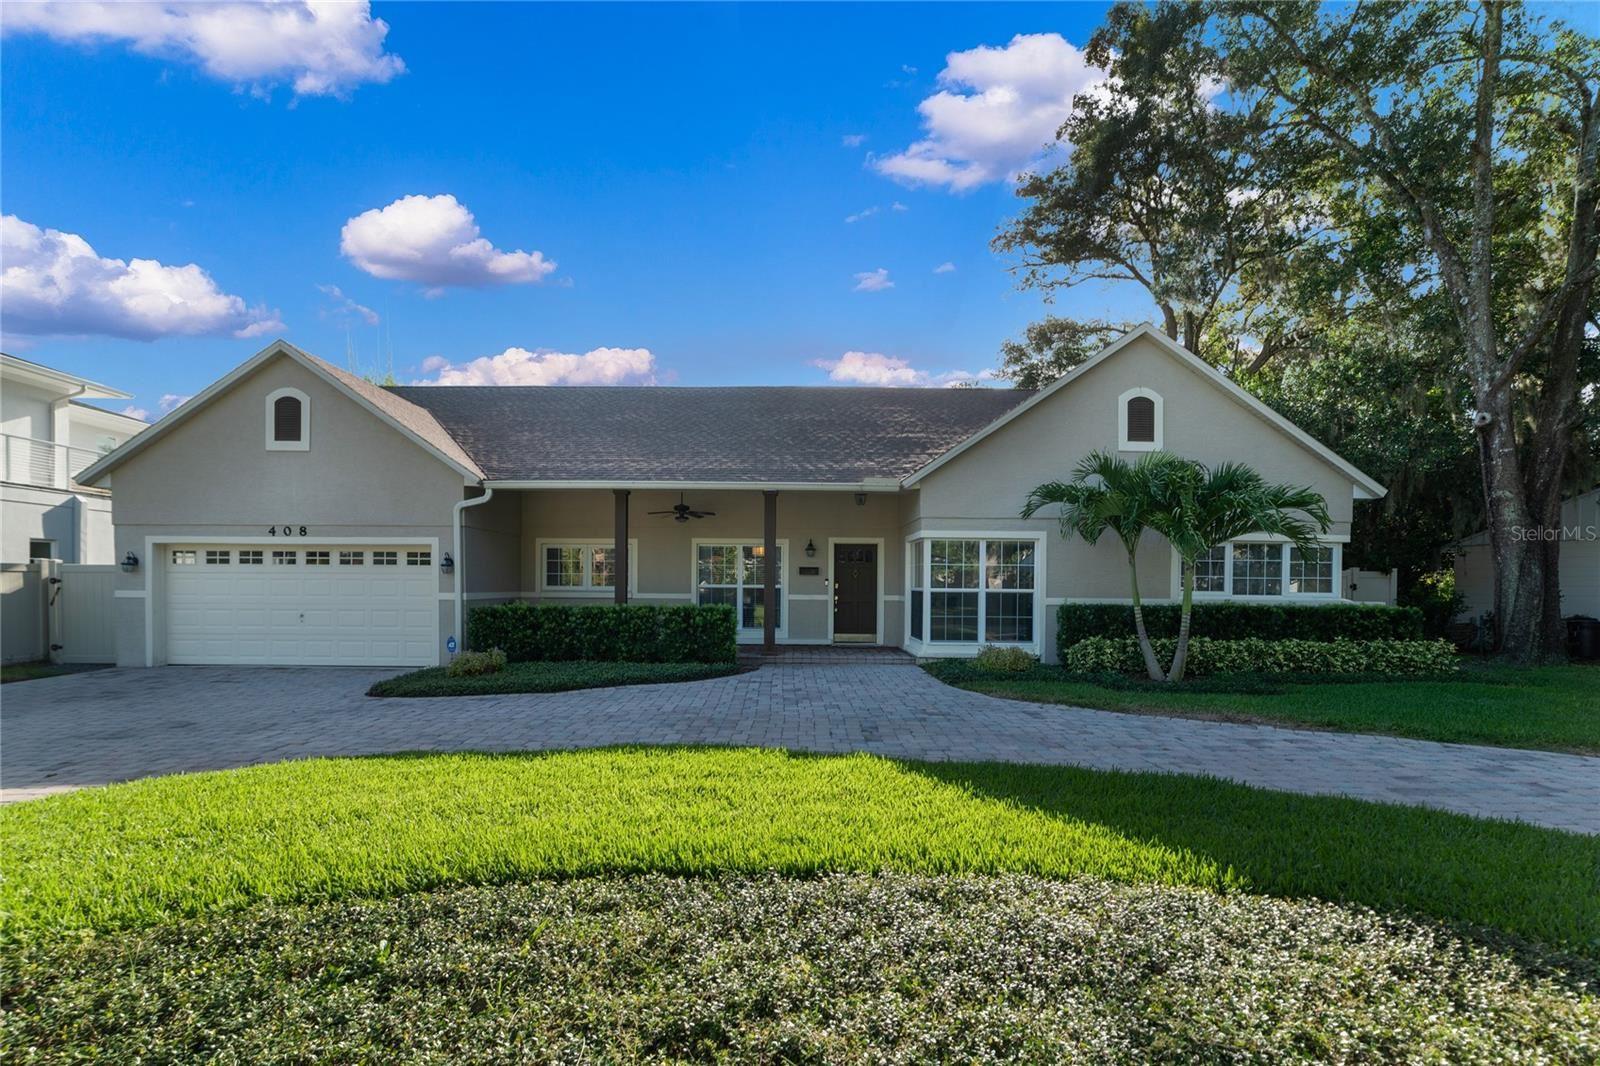 408 WORTHINGTON DRIVE, Winter Park, FL 32789 - #: O5972729